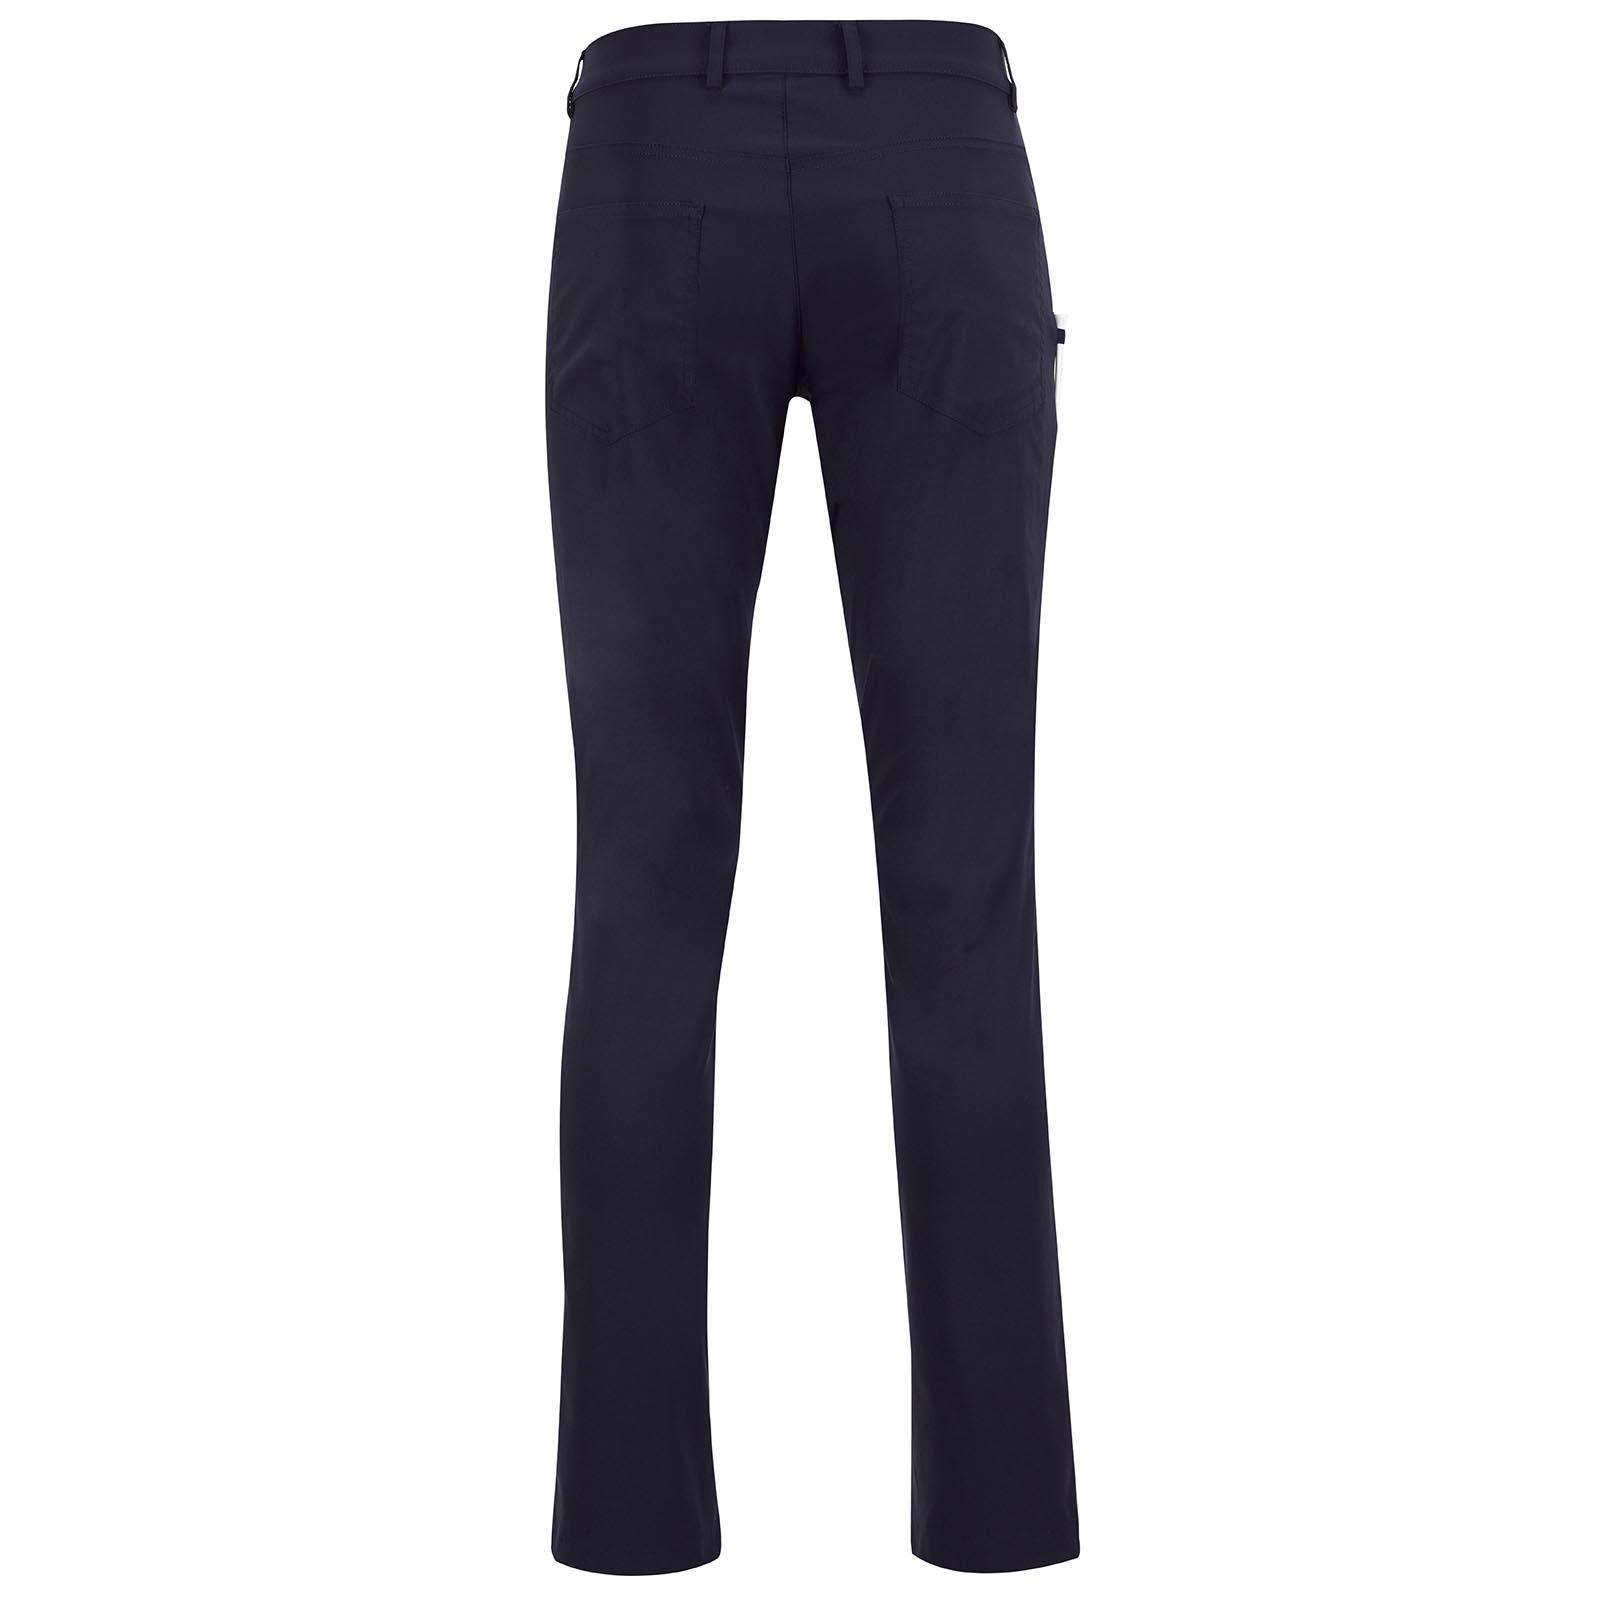 Herren Performance Golfhose mit UV-Schutz im 5-Pocket-Stil